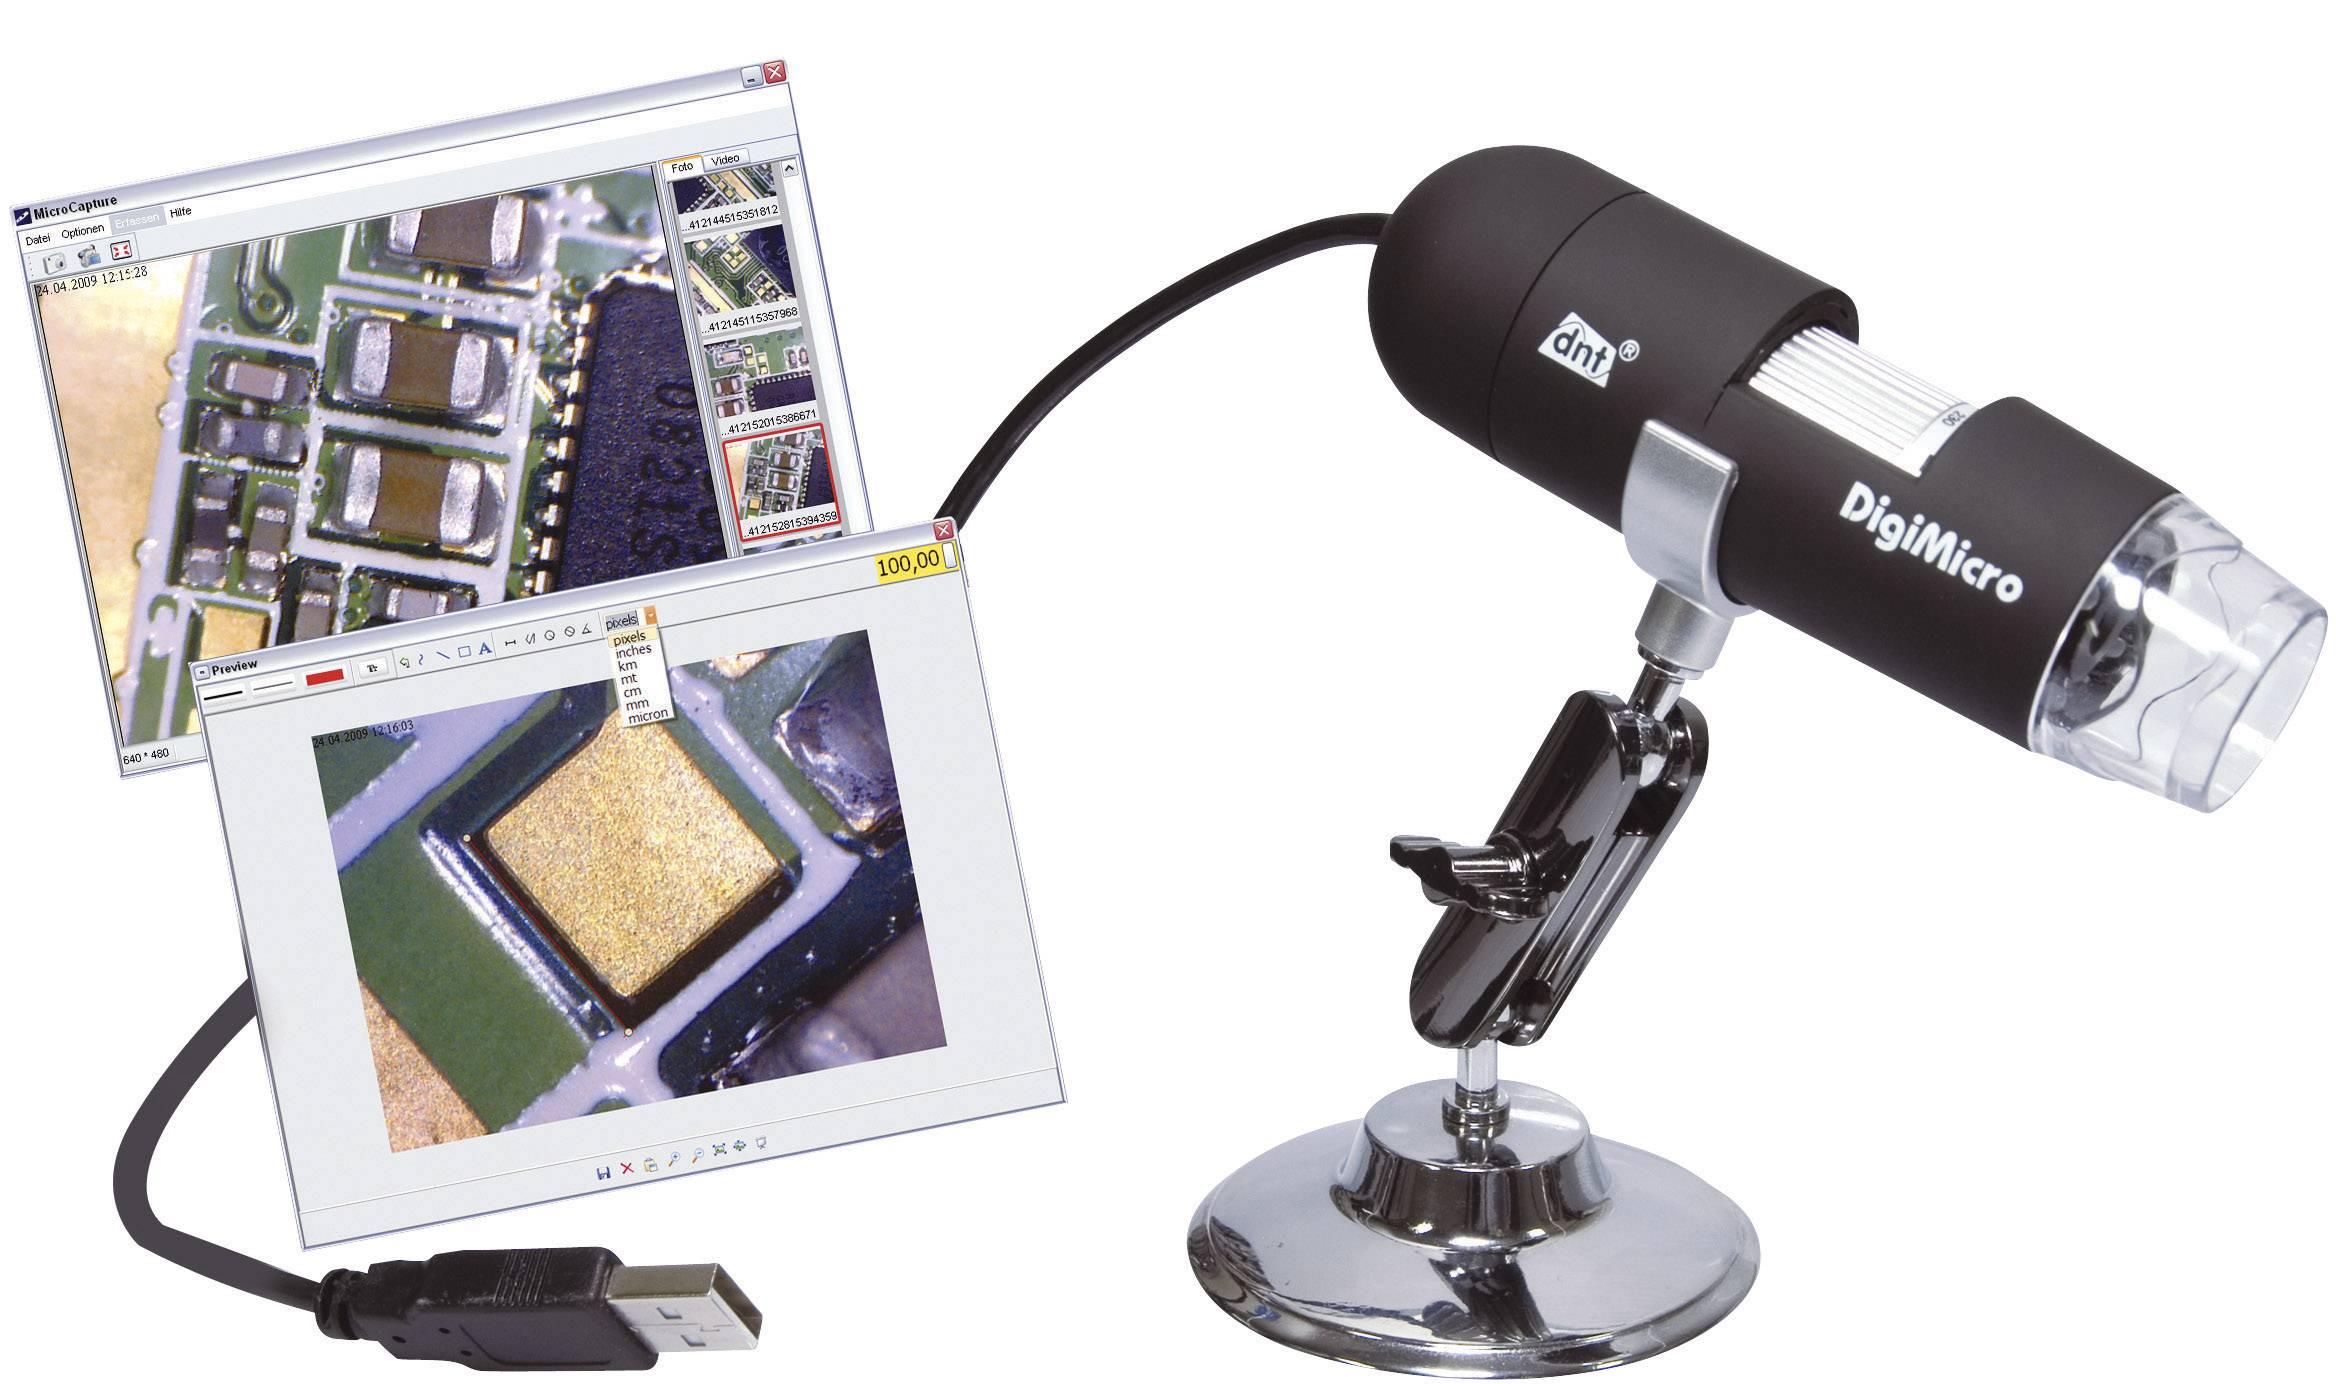 Dnt usb mikroskop mio pixel digitale vergrößerung max x